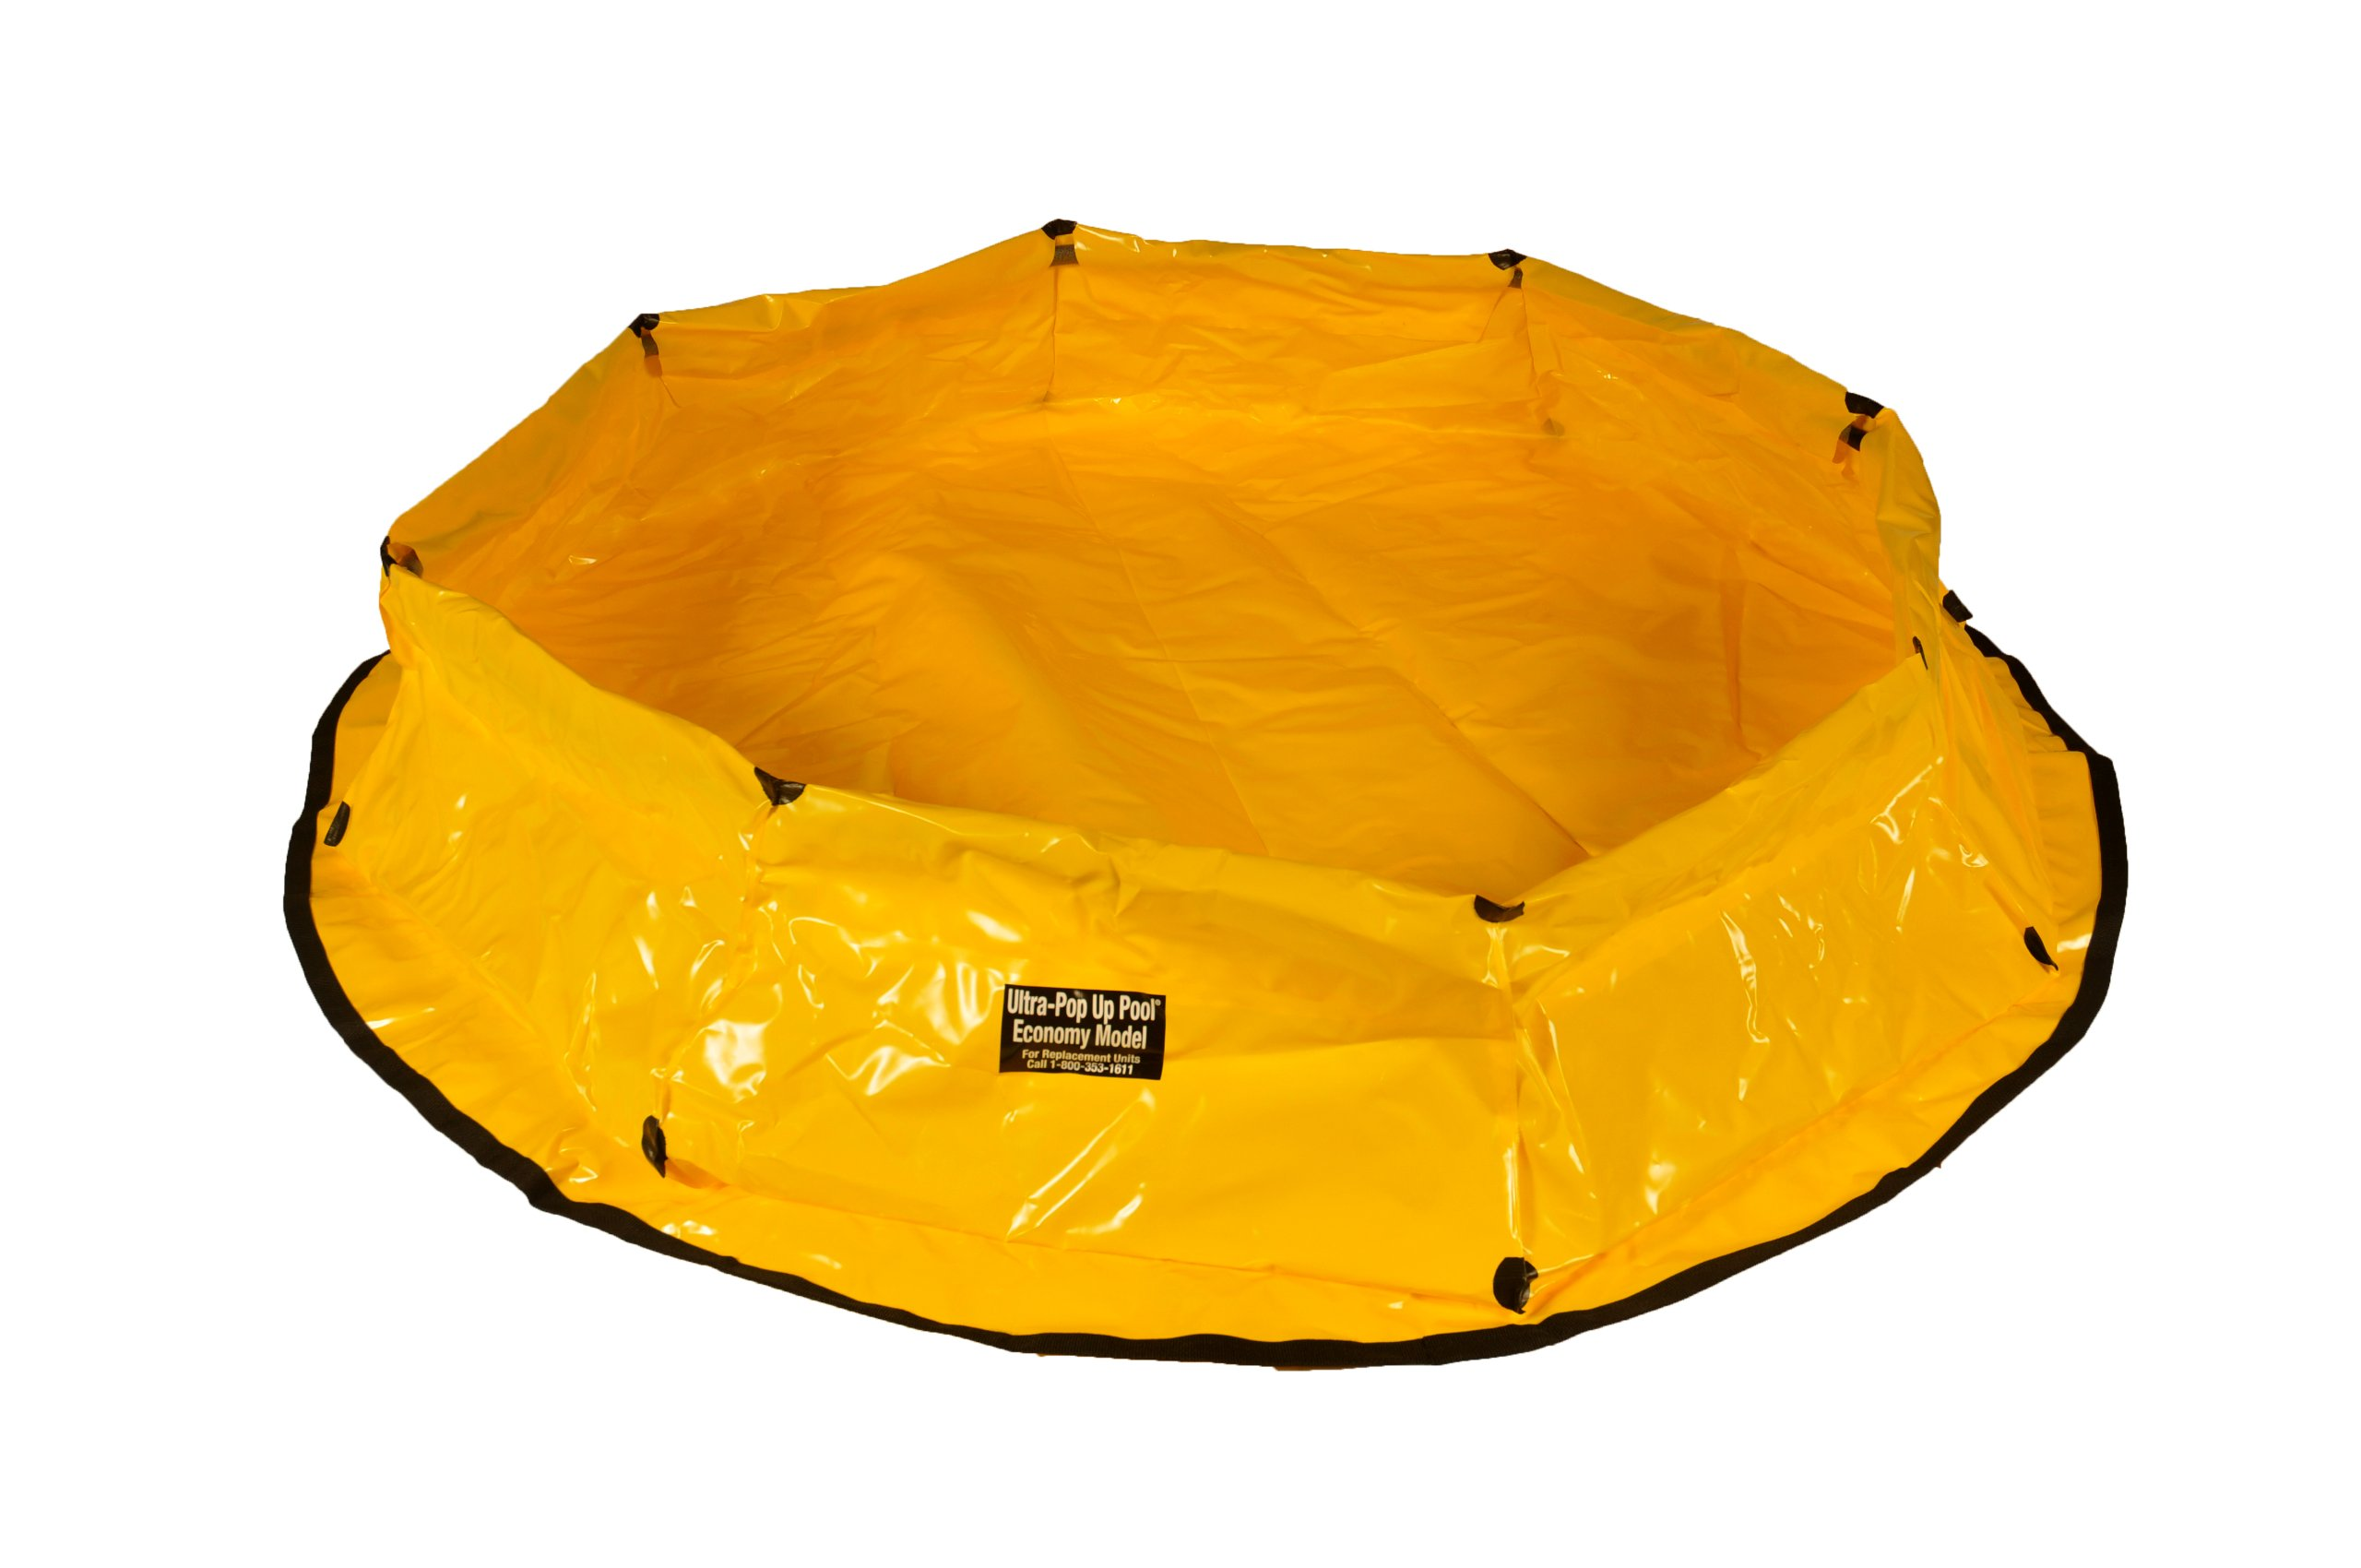 "UltraTech 8153 Economy Polyethylene Ultra-Pop Up Pool, 150 Gallon Capacity, 12"" Height, Yellow"